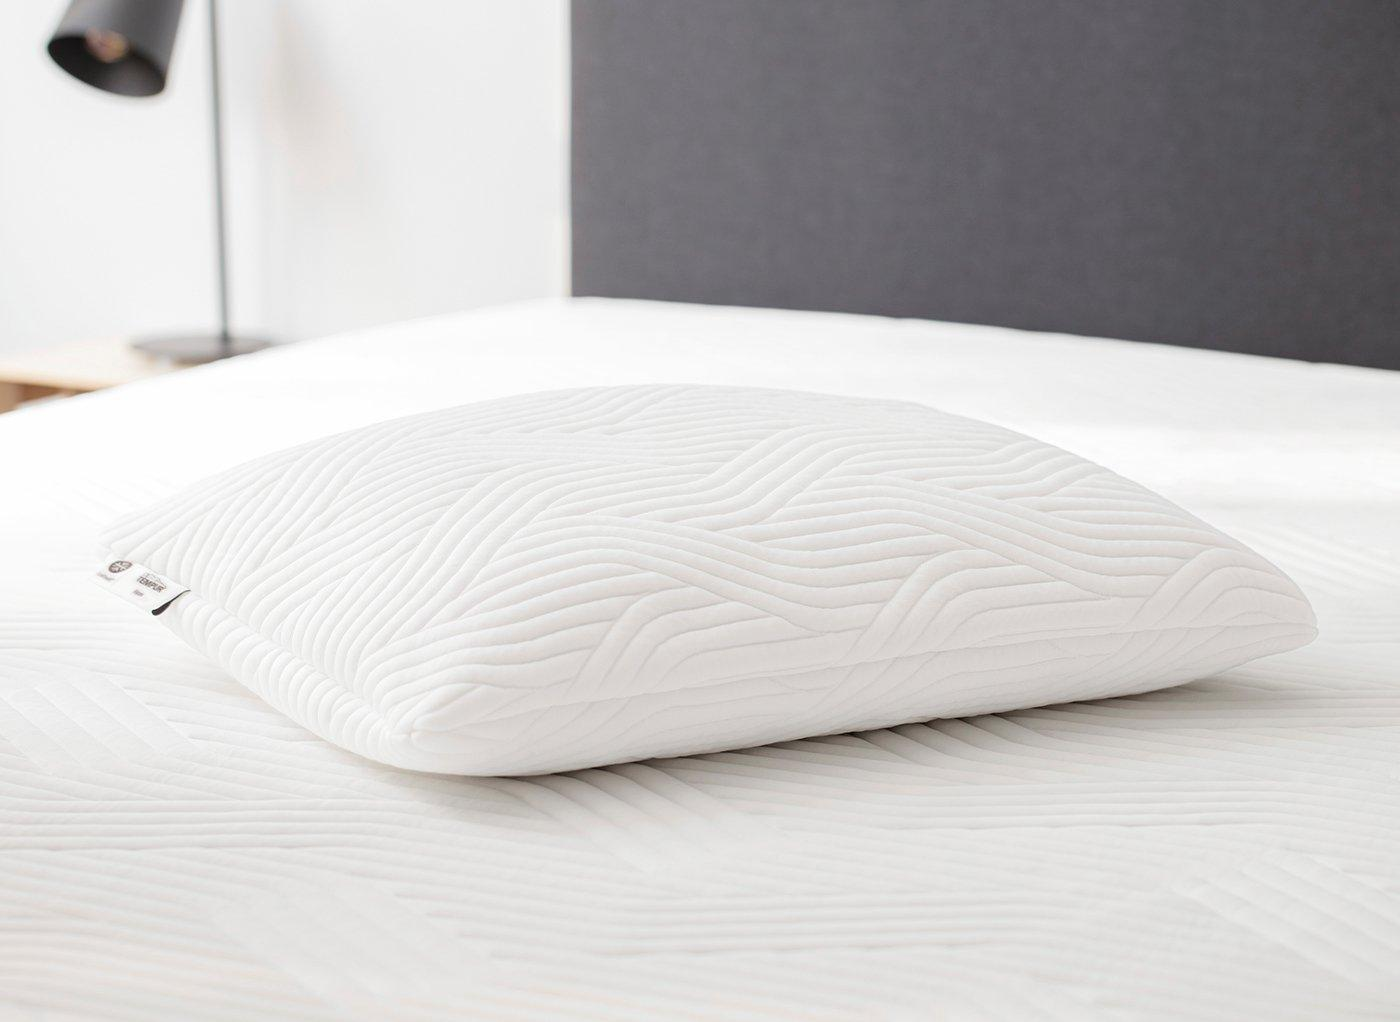 tempur-comfort-cooltouch-pillow